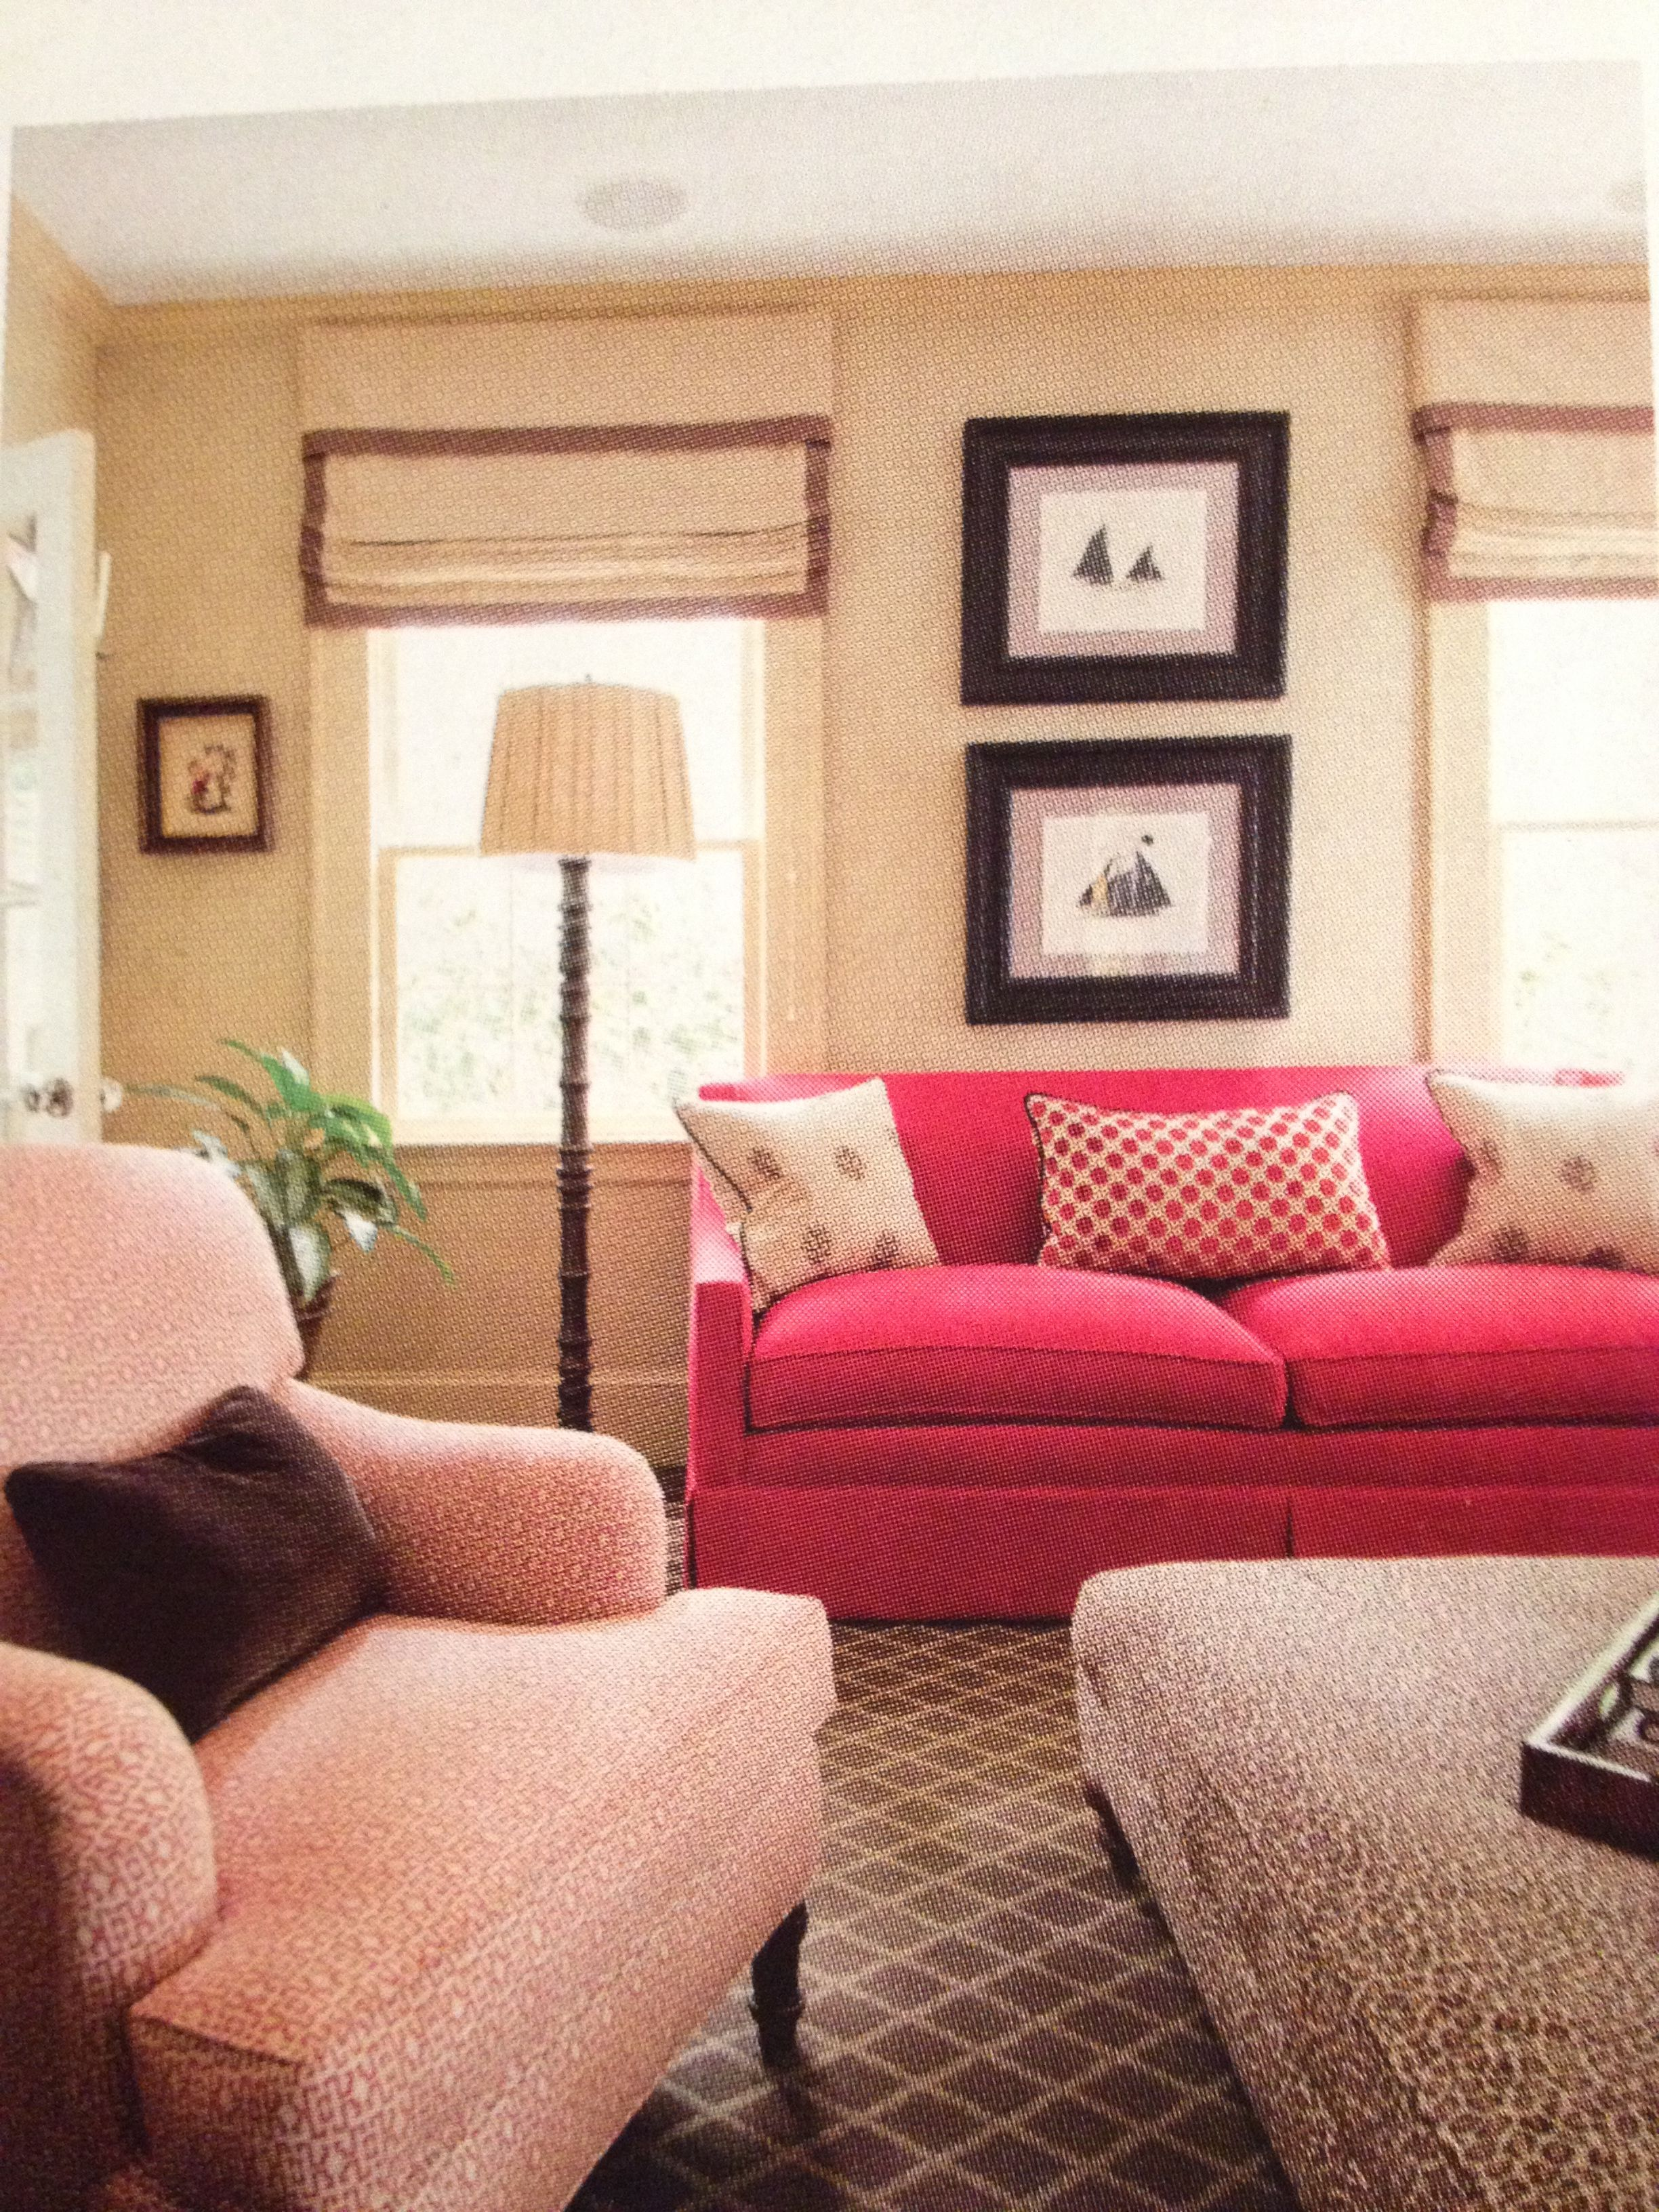 Family Room Red Tan Black Living Room Wall Color Beige Living Rooms Family Living Rooms #red #and #beige #living #room #ideas